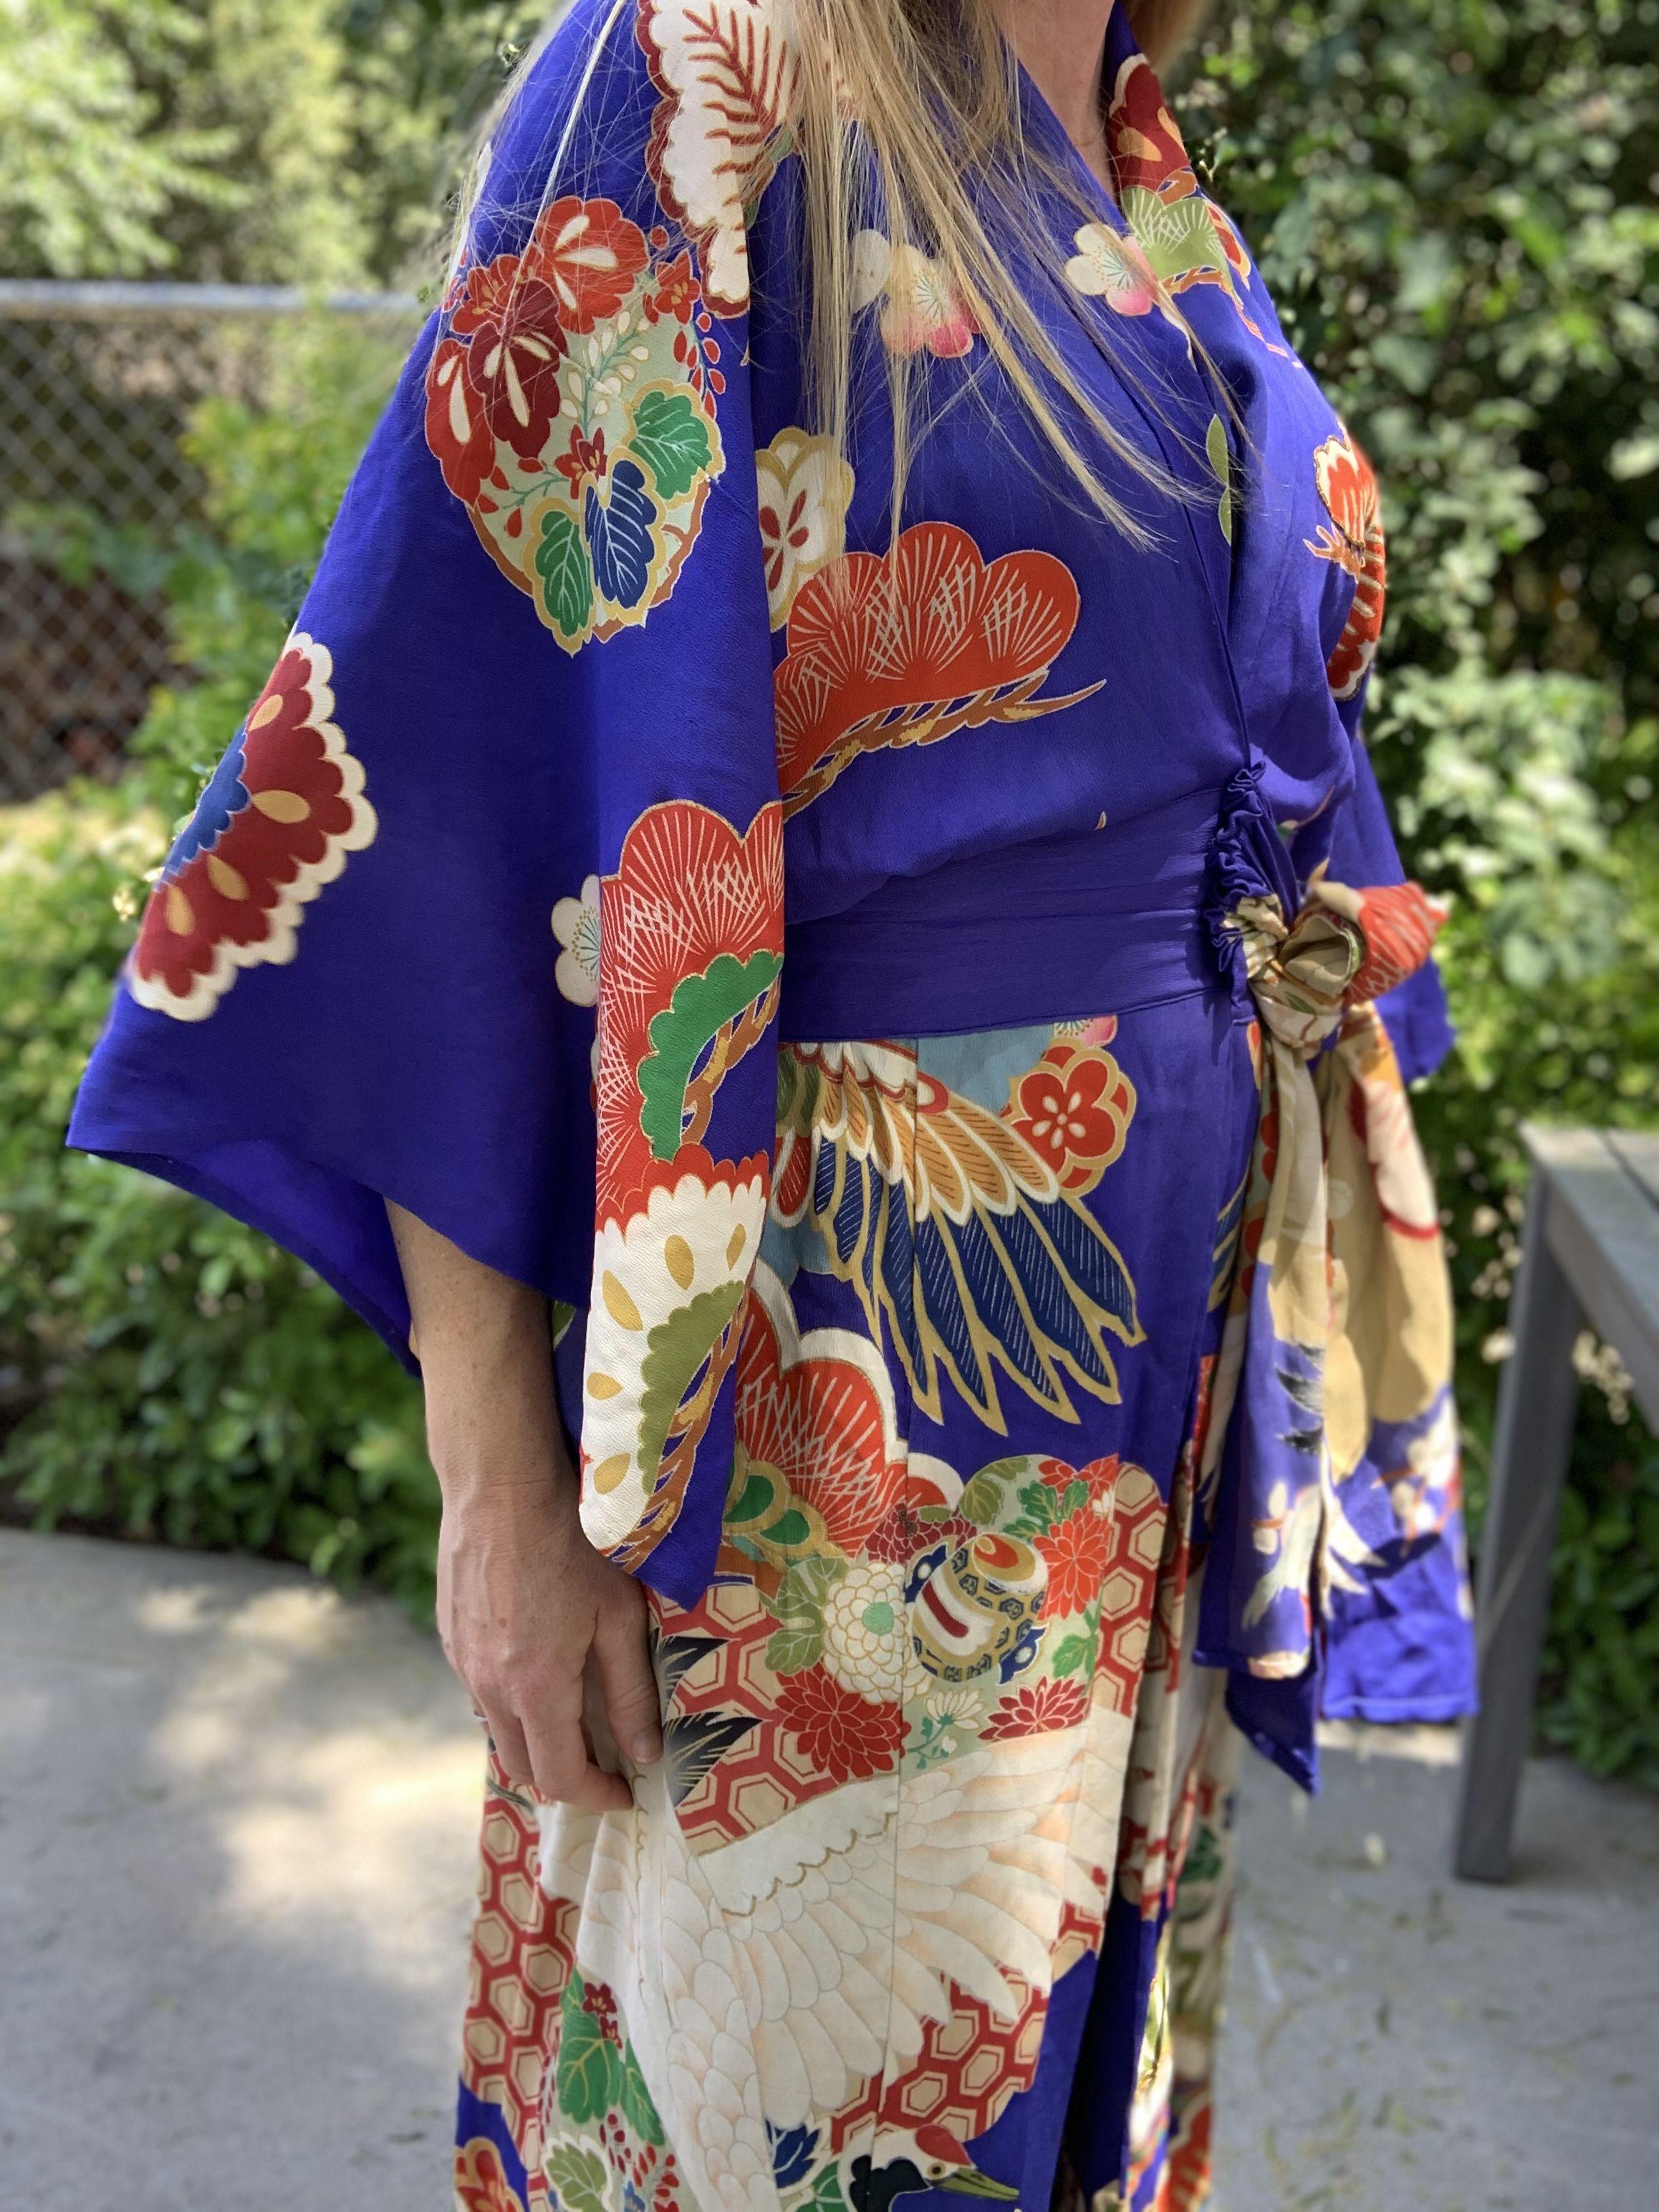 Vintage 1920s Kimono #vintagestyle #vintagefashion #1920s #20saesthetic #vintagestyle